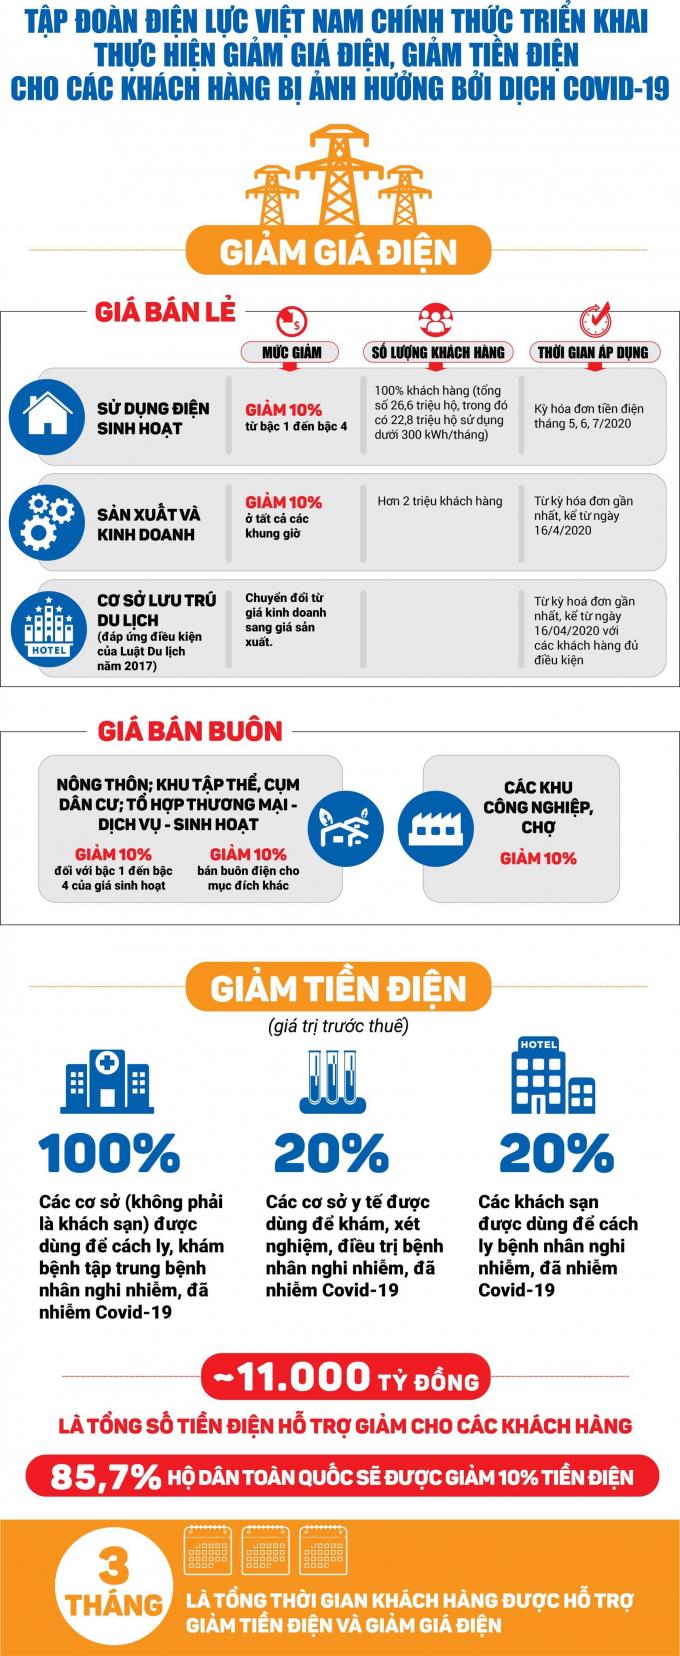 Infographic giam gia dien